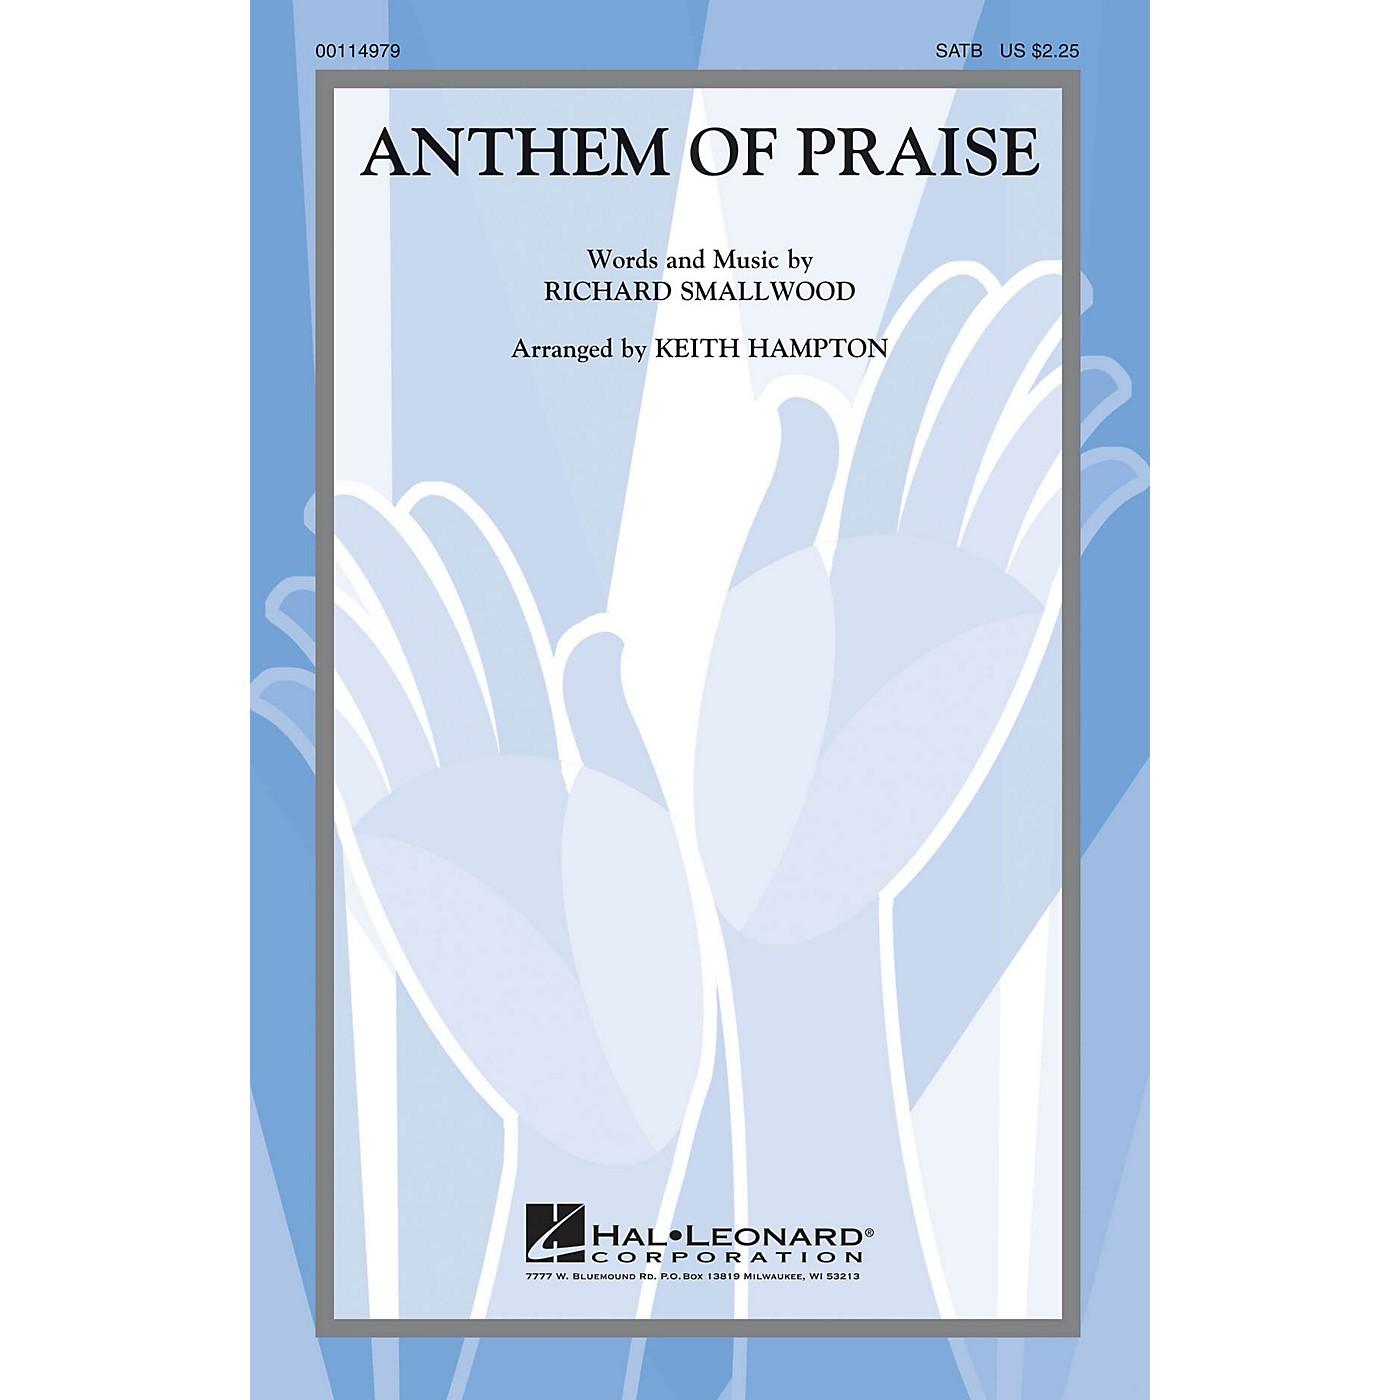 Hal Leonard Anthem of Praise SATB arranged by Keith Hampton thumbnail